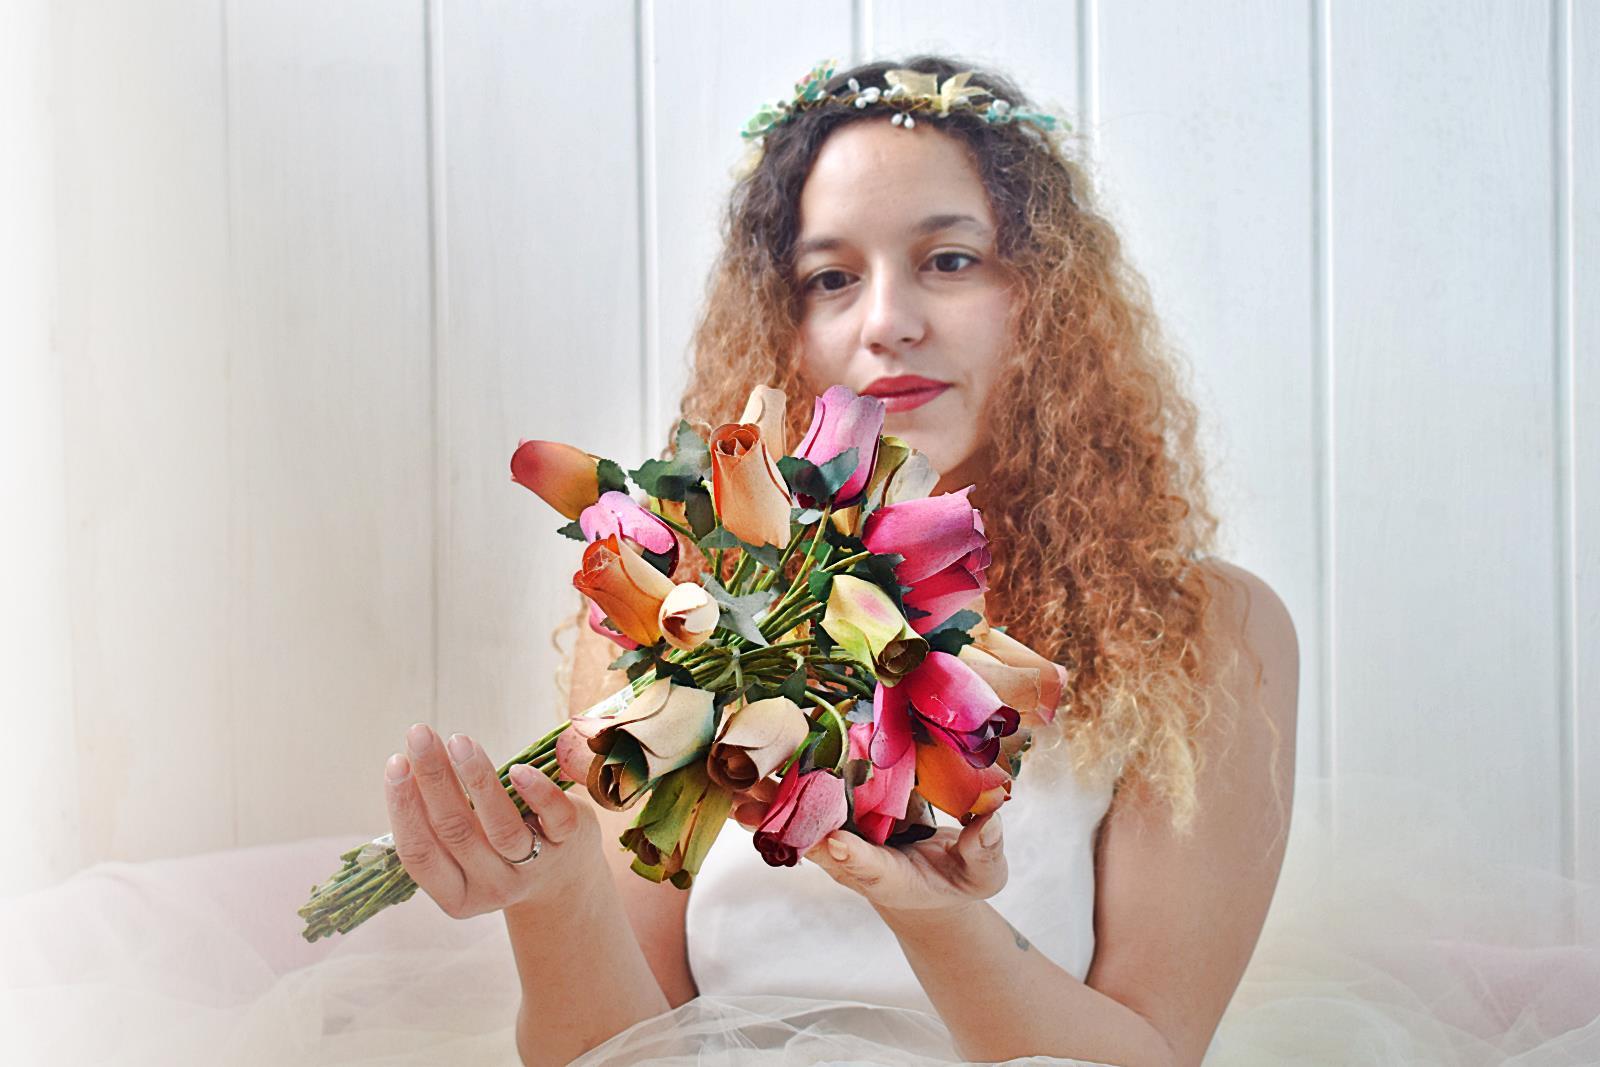 Olivia et les roses 5